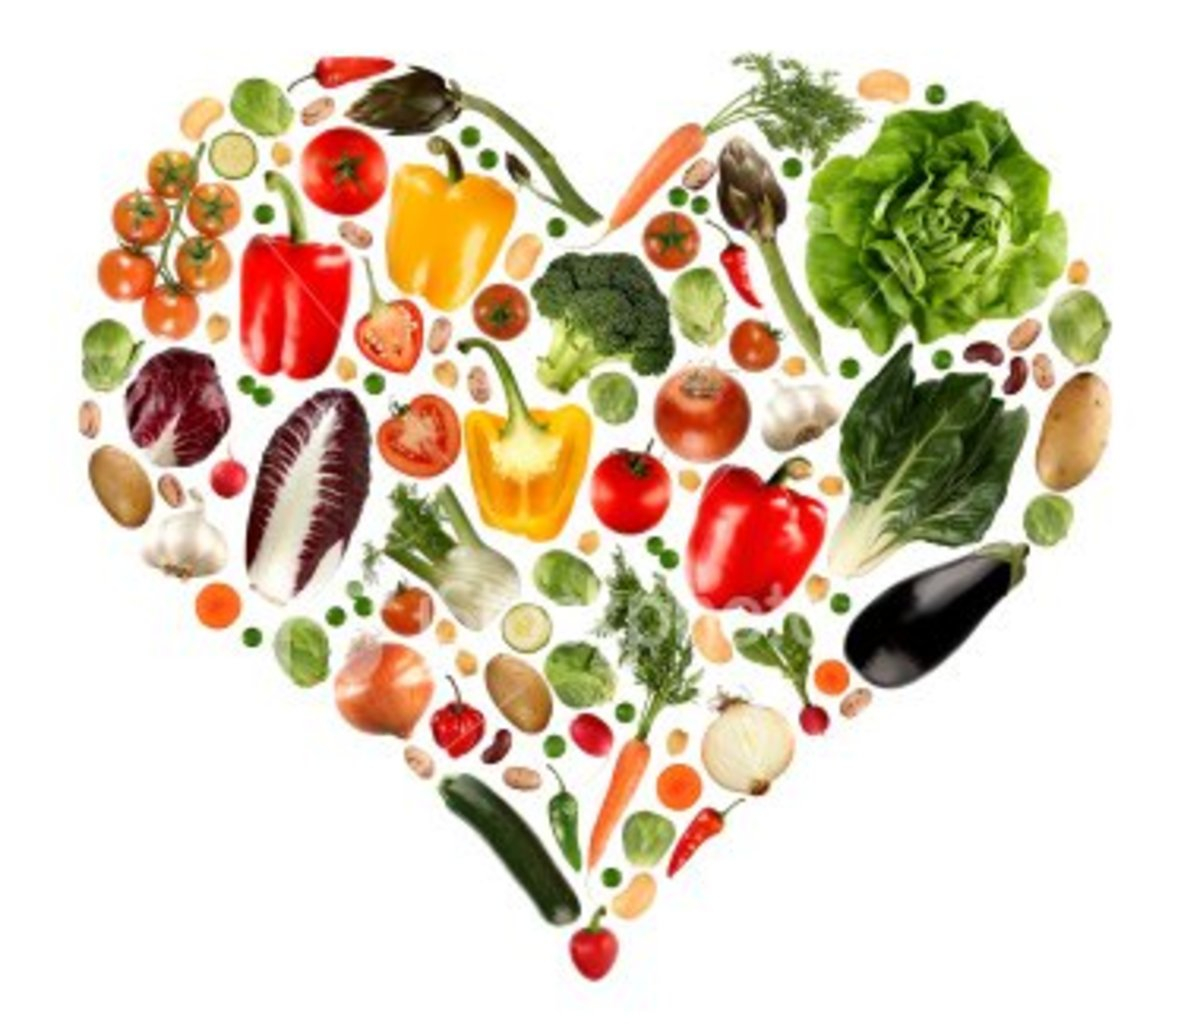 i love healthy eating!